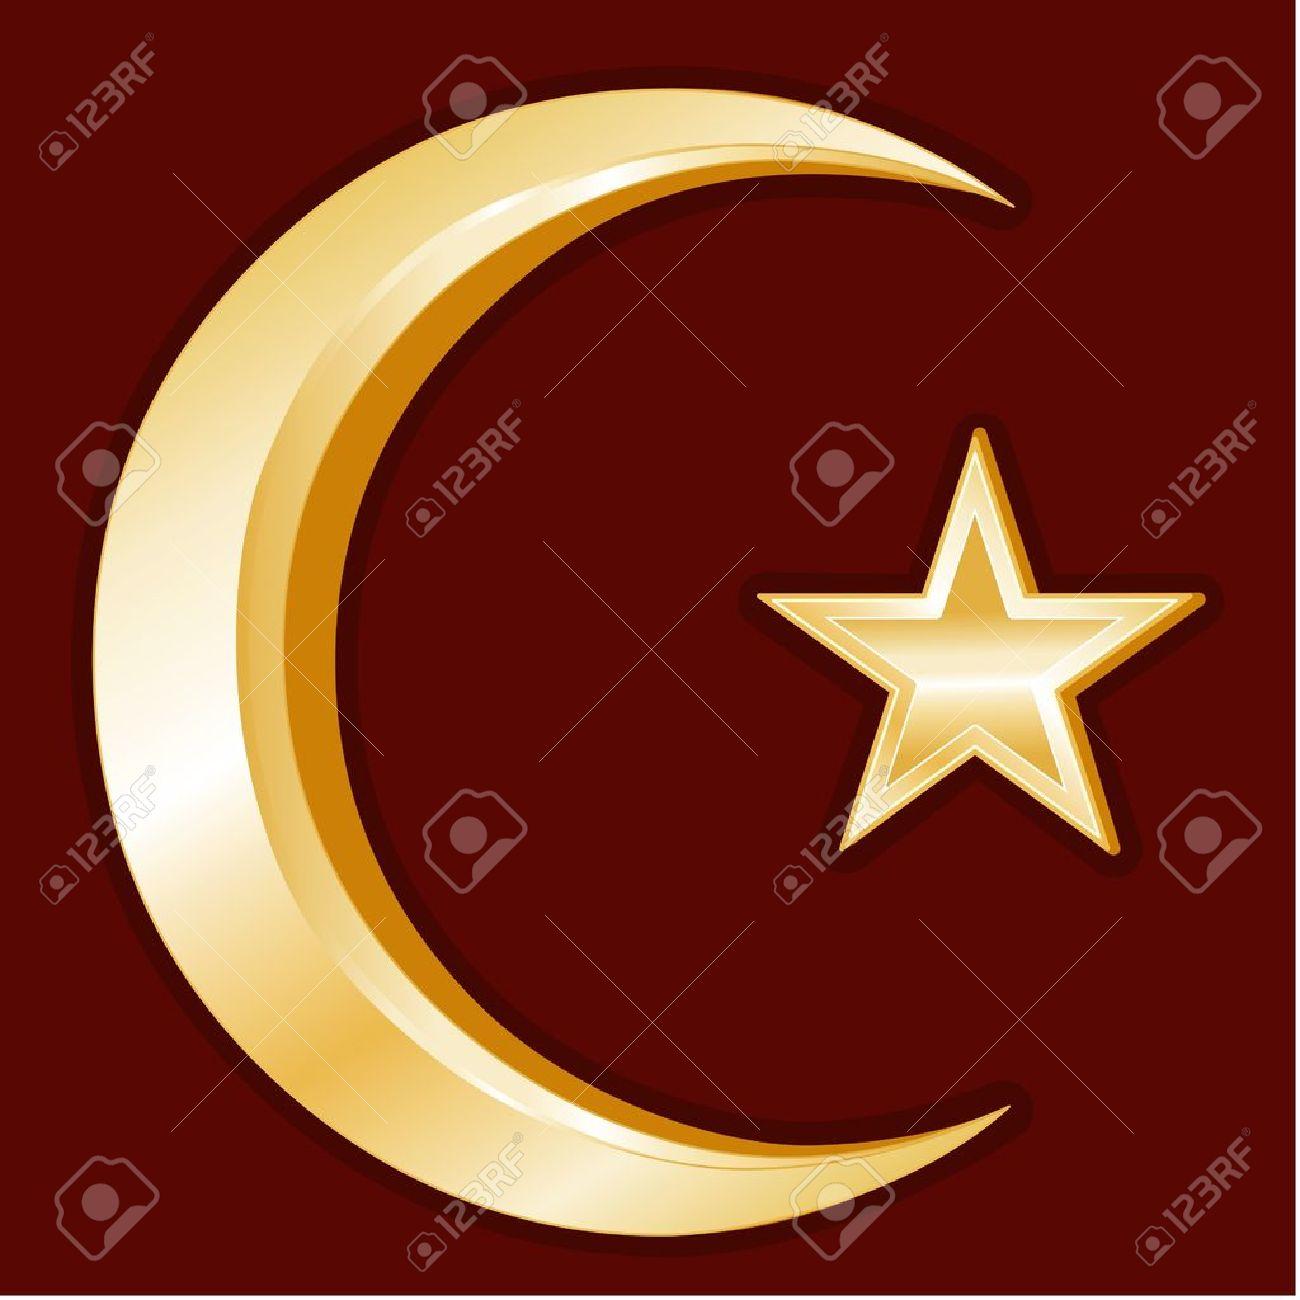 Islam Symbol, Gold Crescent And Star Icon, Crimson Red Background ...